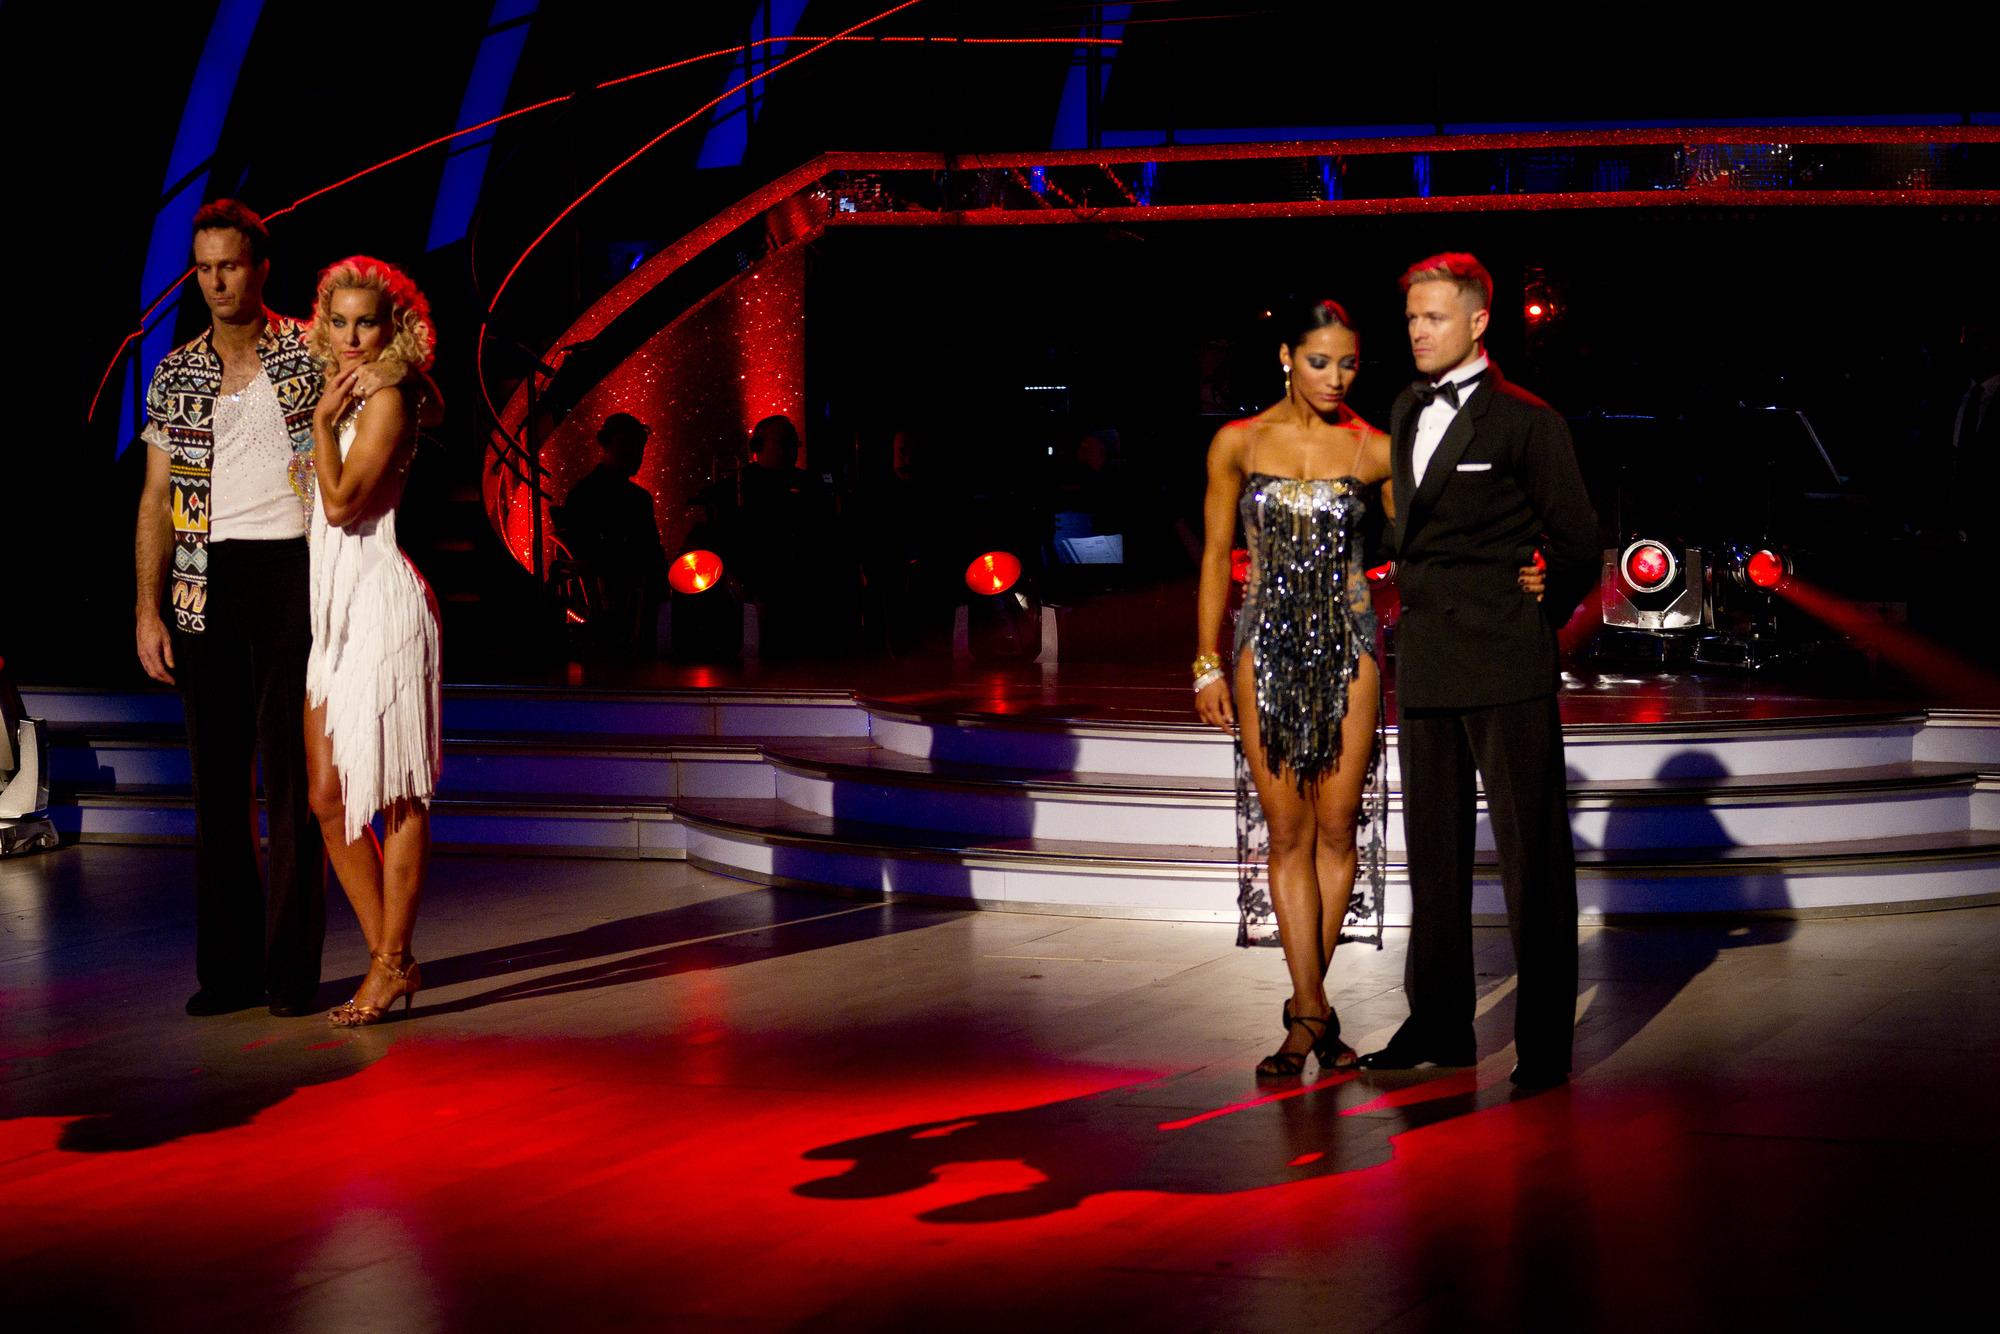 Nicky Byrne, Karen Hauer, Natalie Lowe, Michael Vaughan - (C) BBC - Photographer: Guy Levy